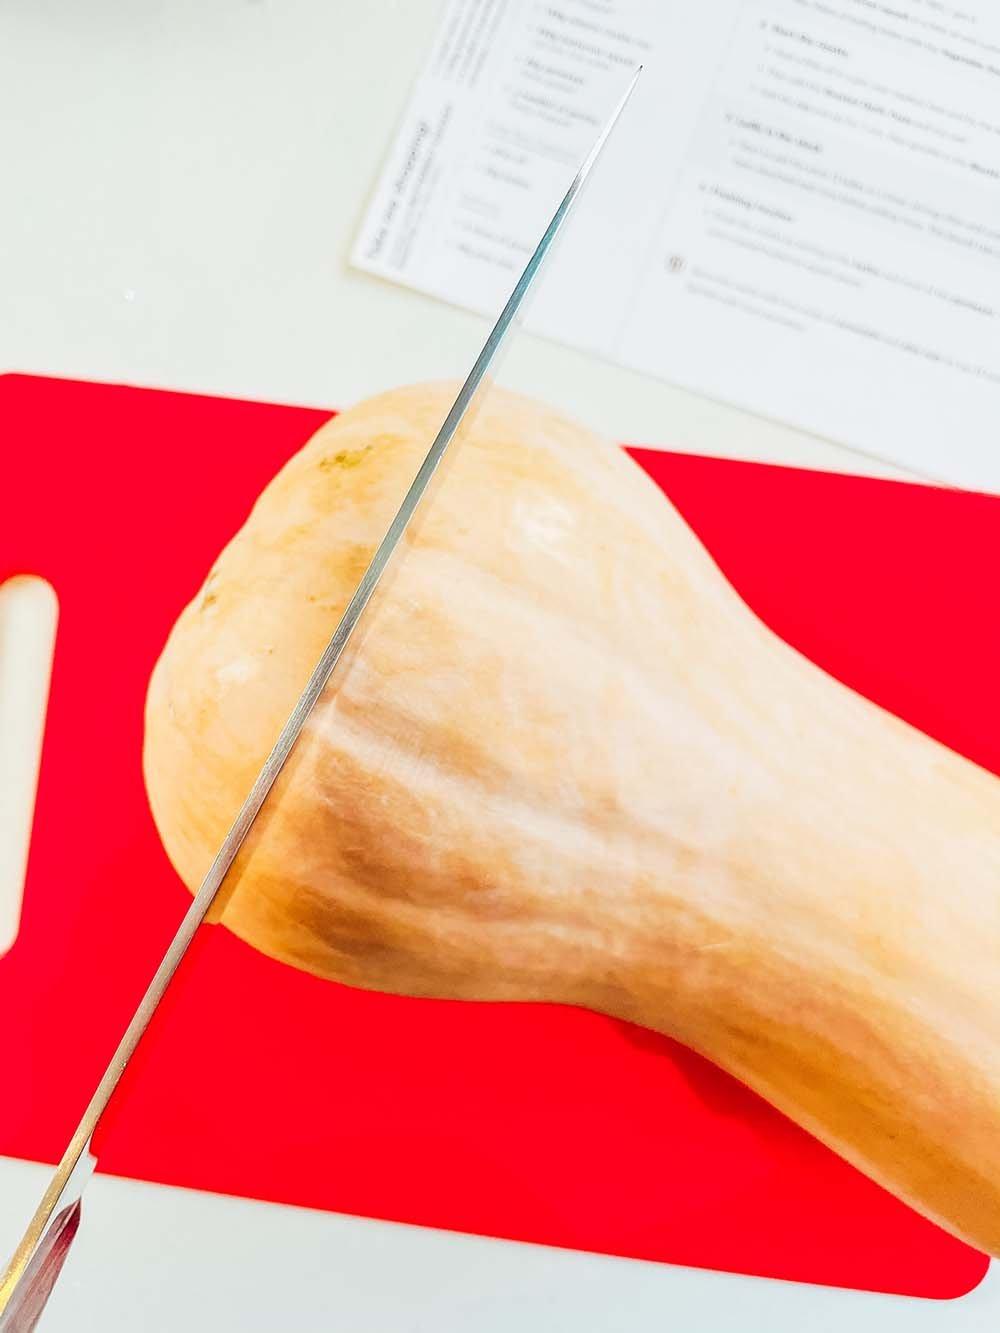 How to cut a butternut squash